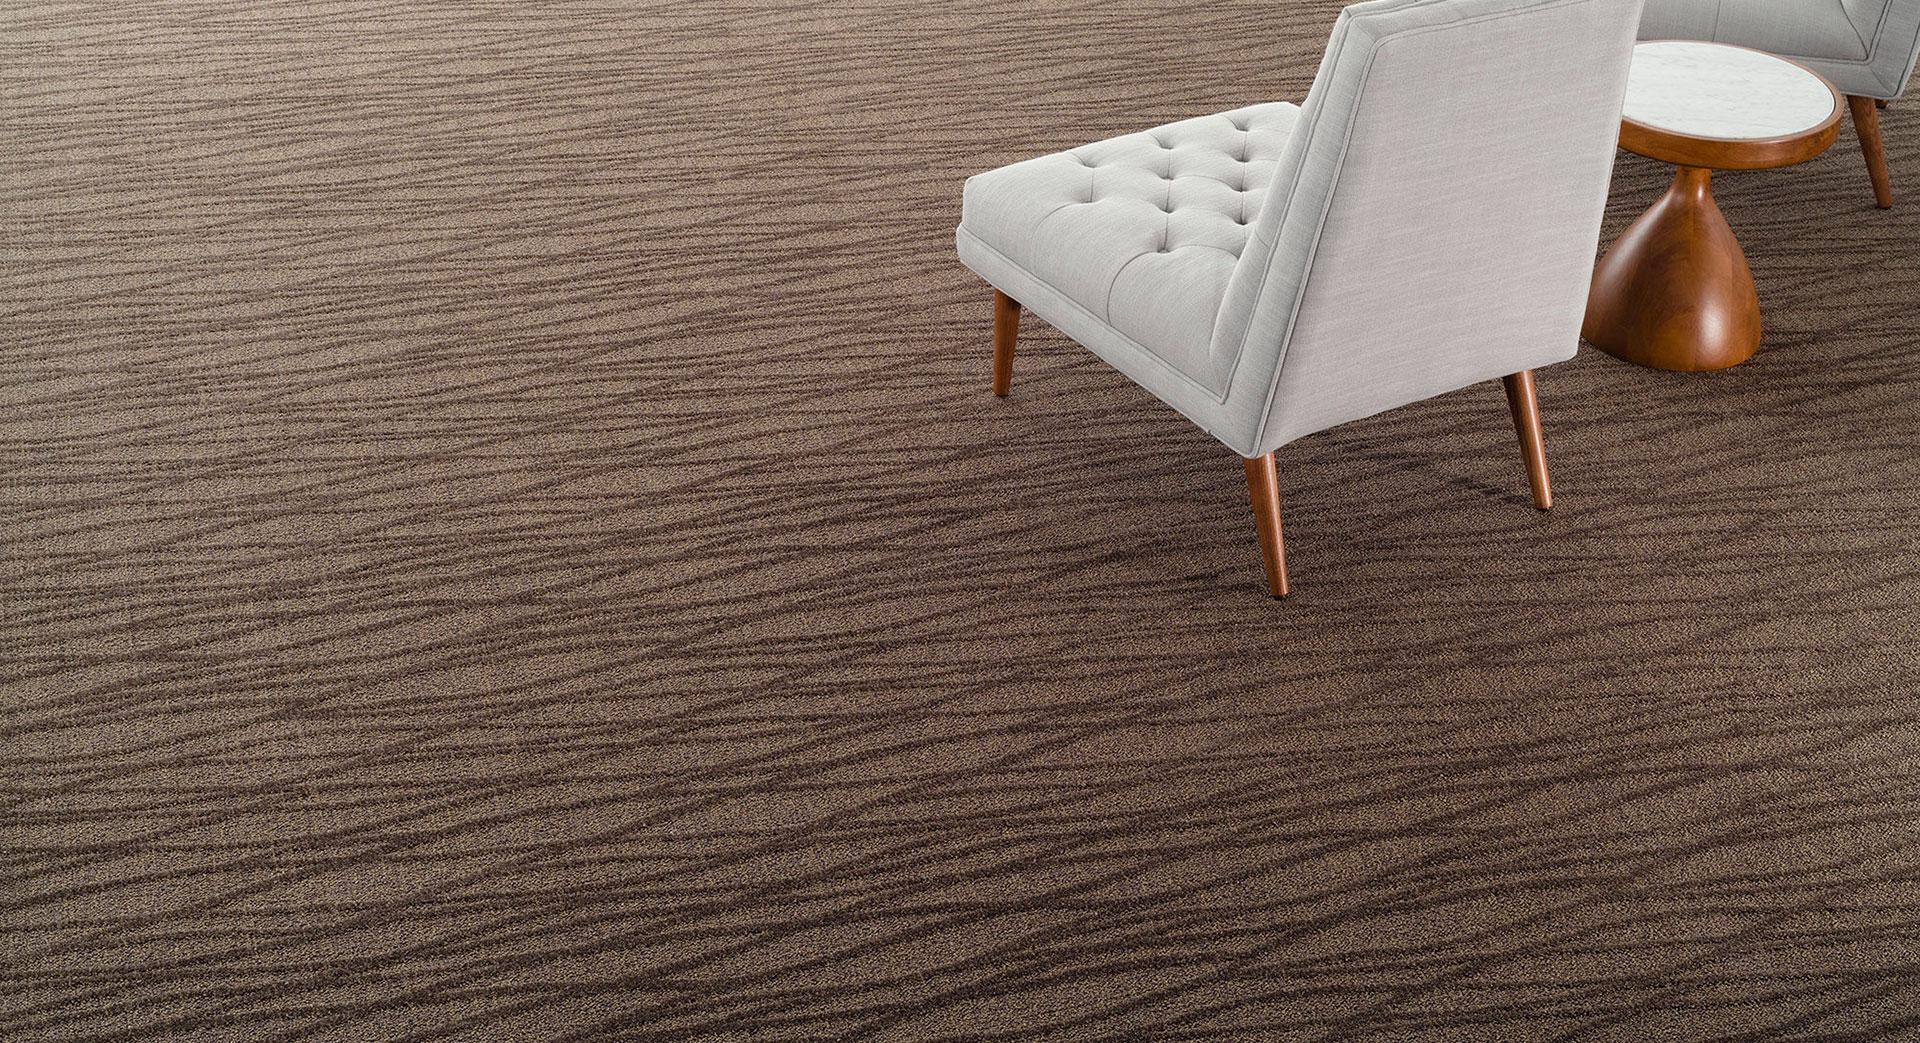 commercial carpet tile broadloom carpet SAIGHOT